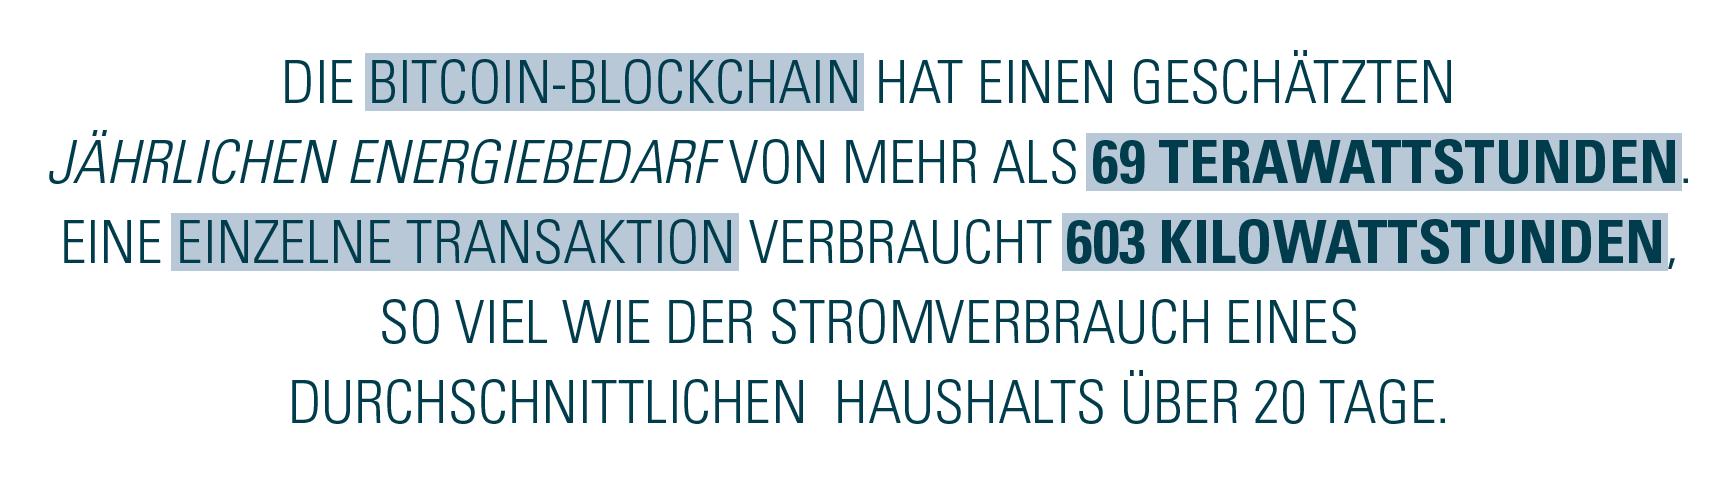 Energiebedarf Bitcoin-Blockchain